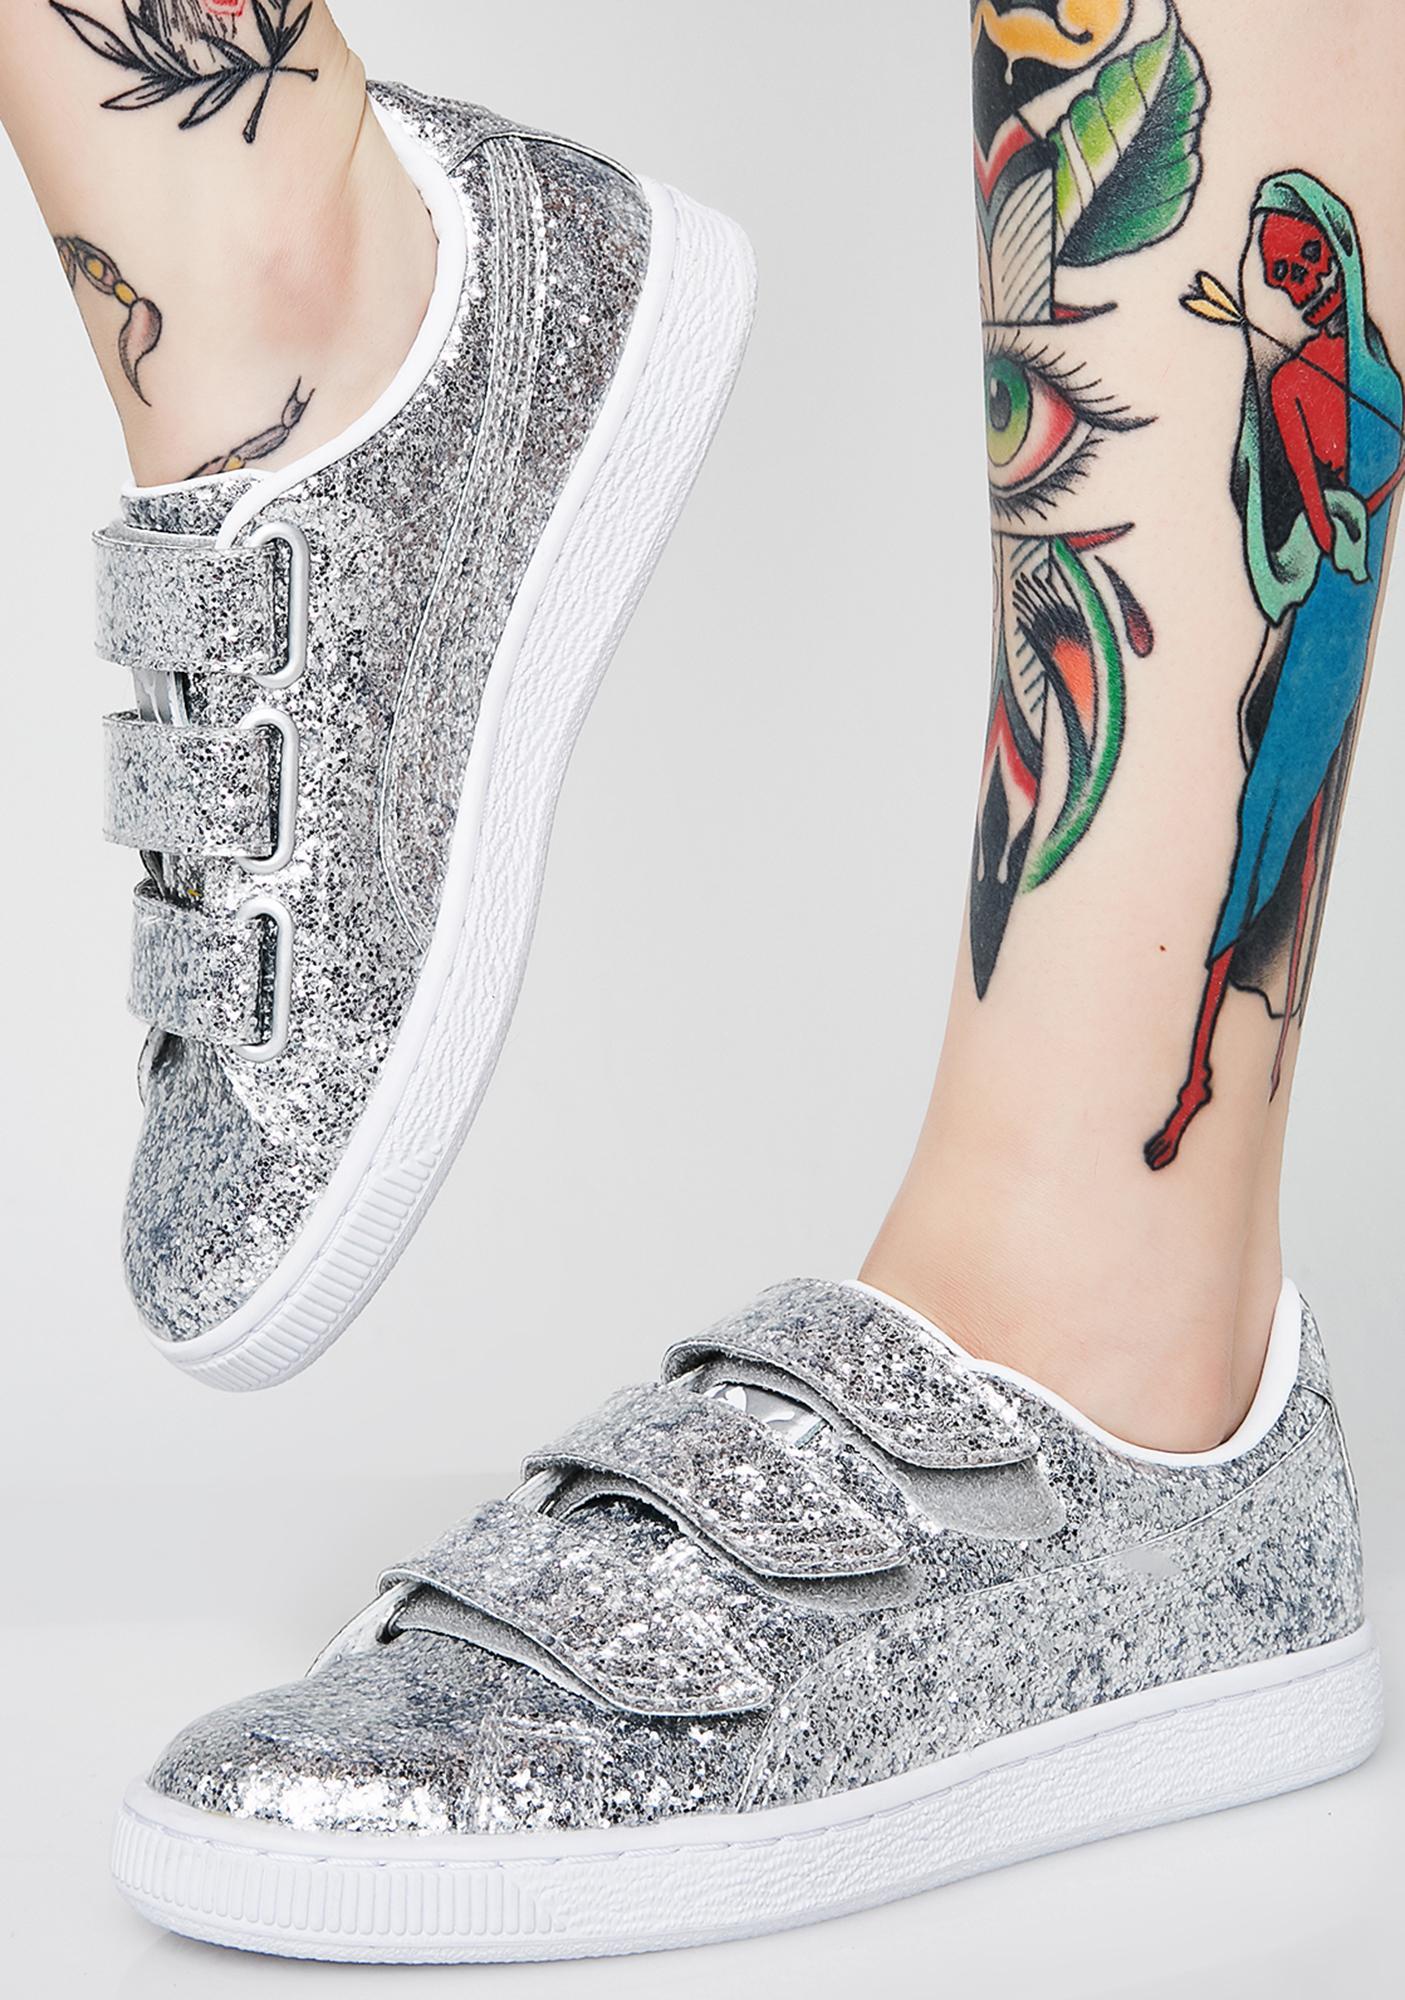 PUMA Basket Strap Glitter Sneakers